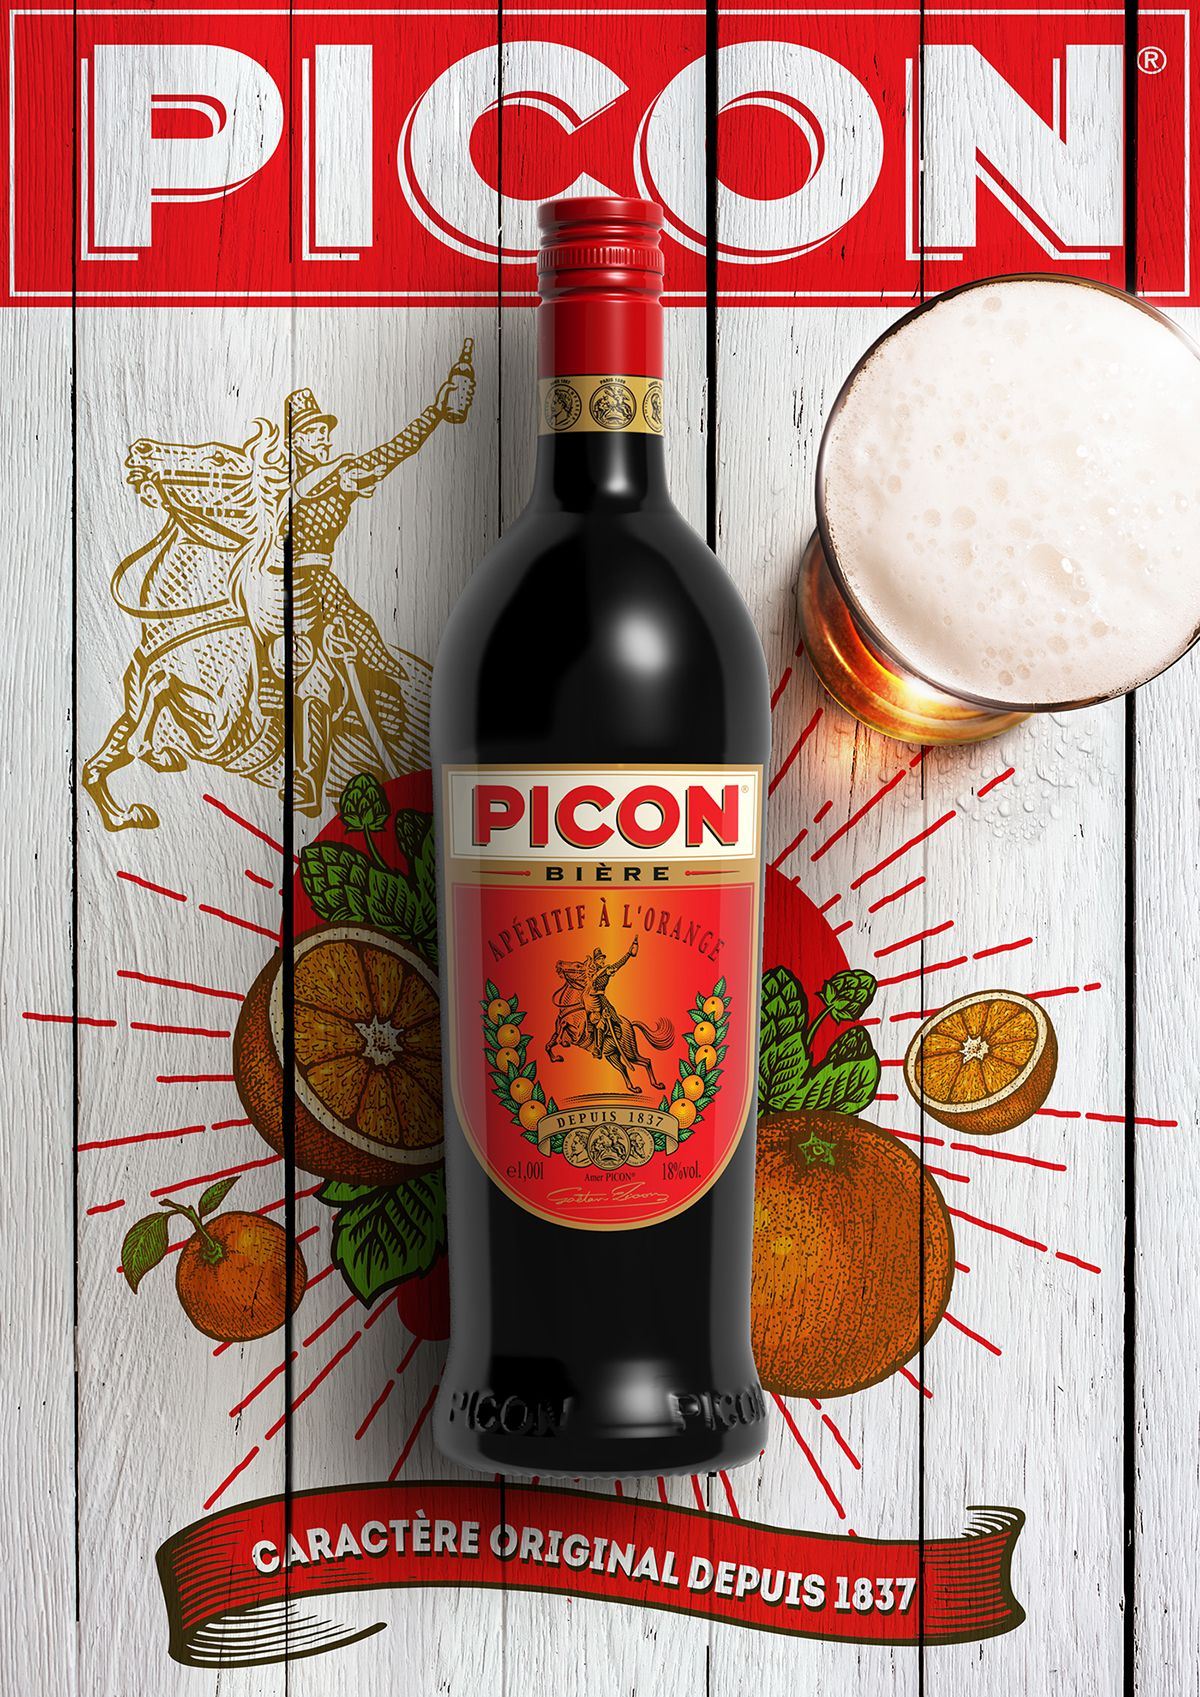 Campagne De Publicite Pour Picon On Behance Picon Biere Biere Campagne